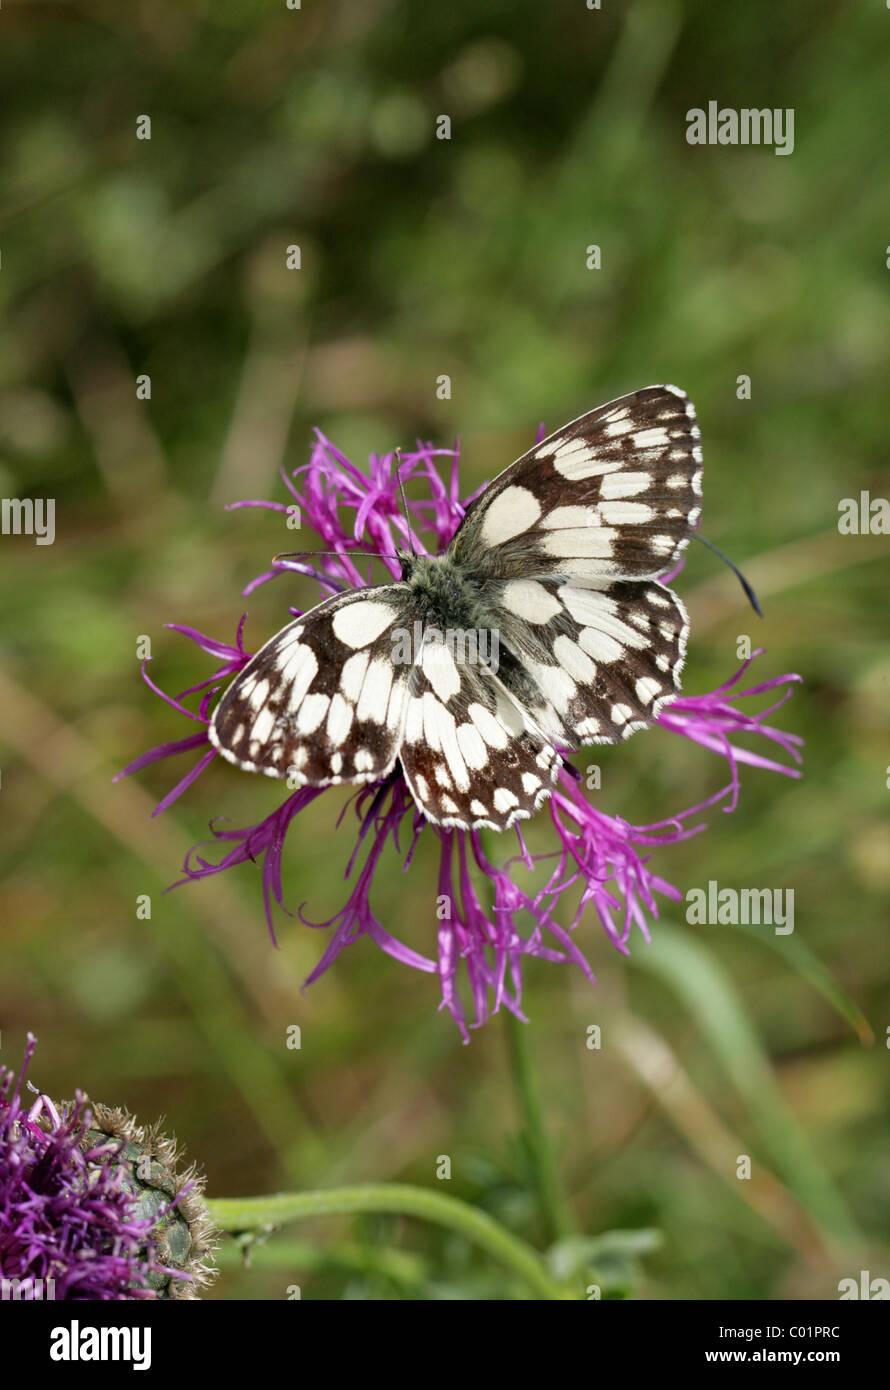 Marbled White Butterfly, Melanargia galathea, Nymphalidae, Lepidoptera. - Stock Image